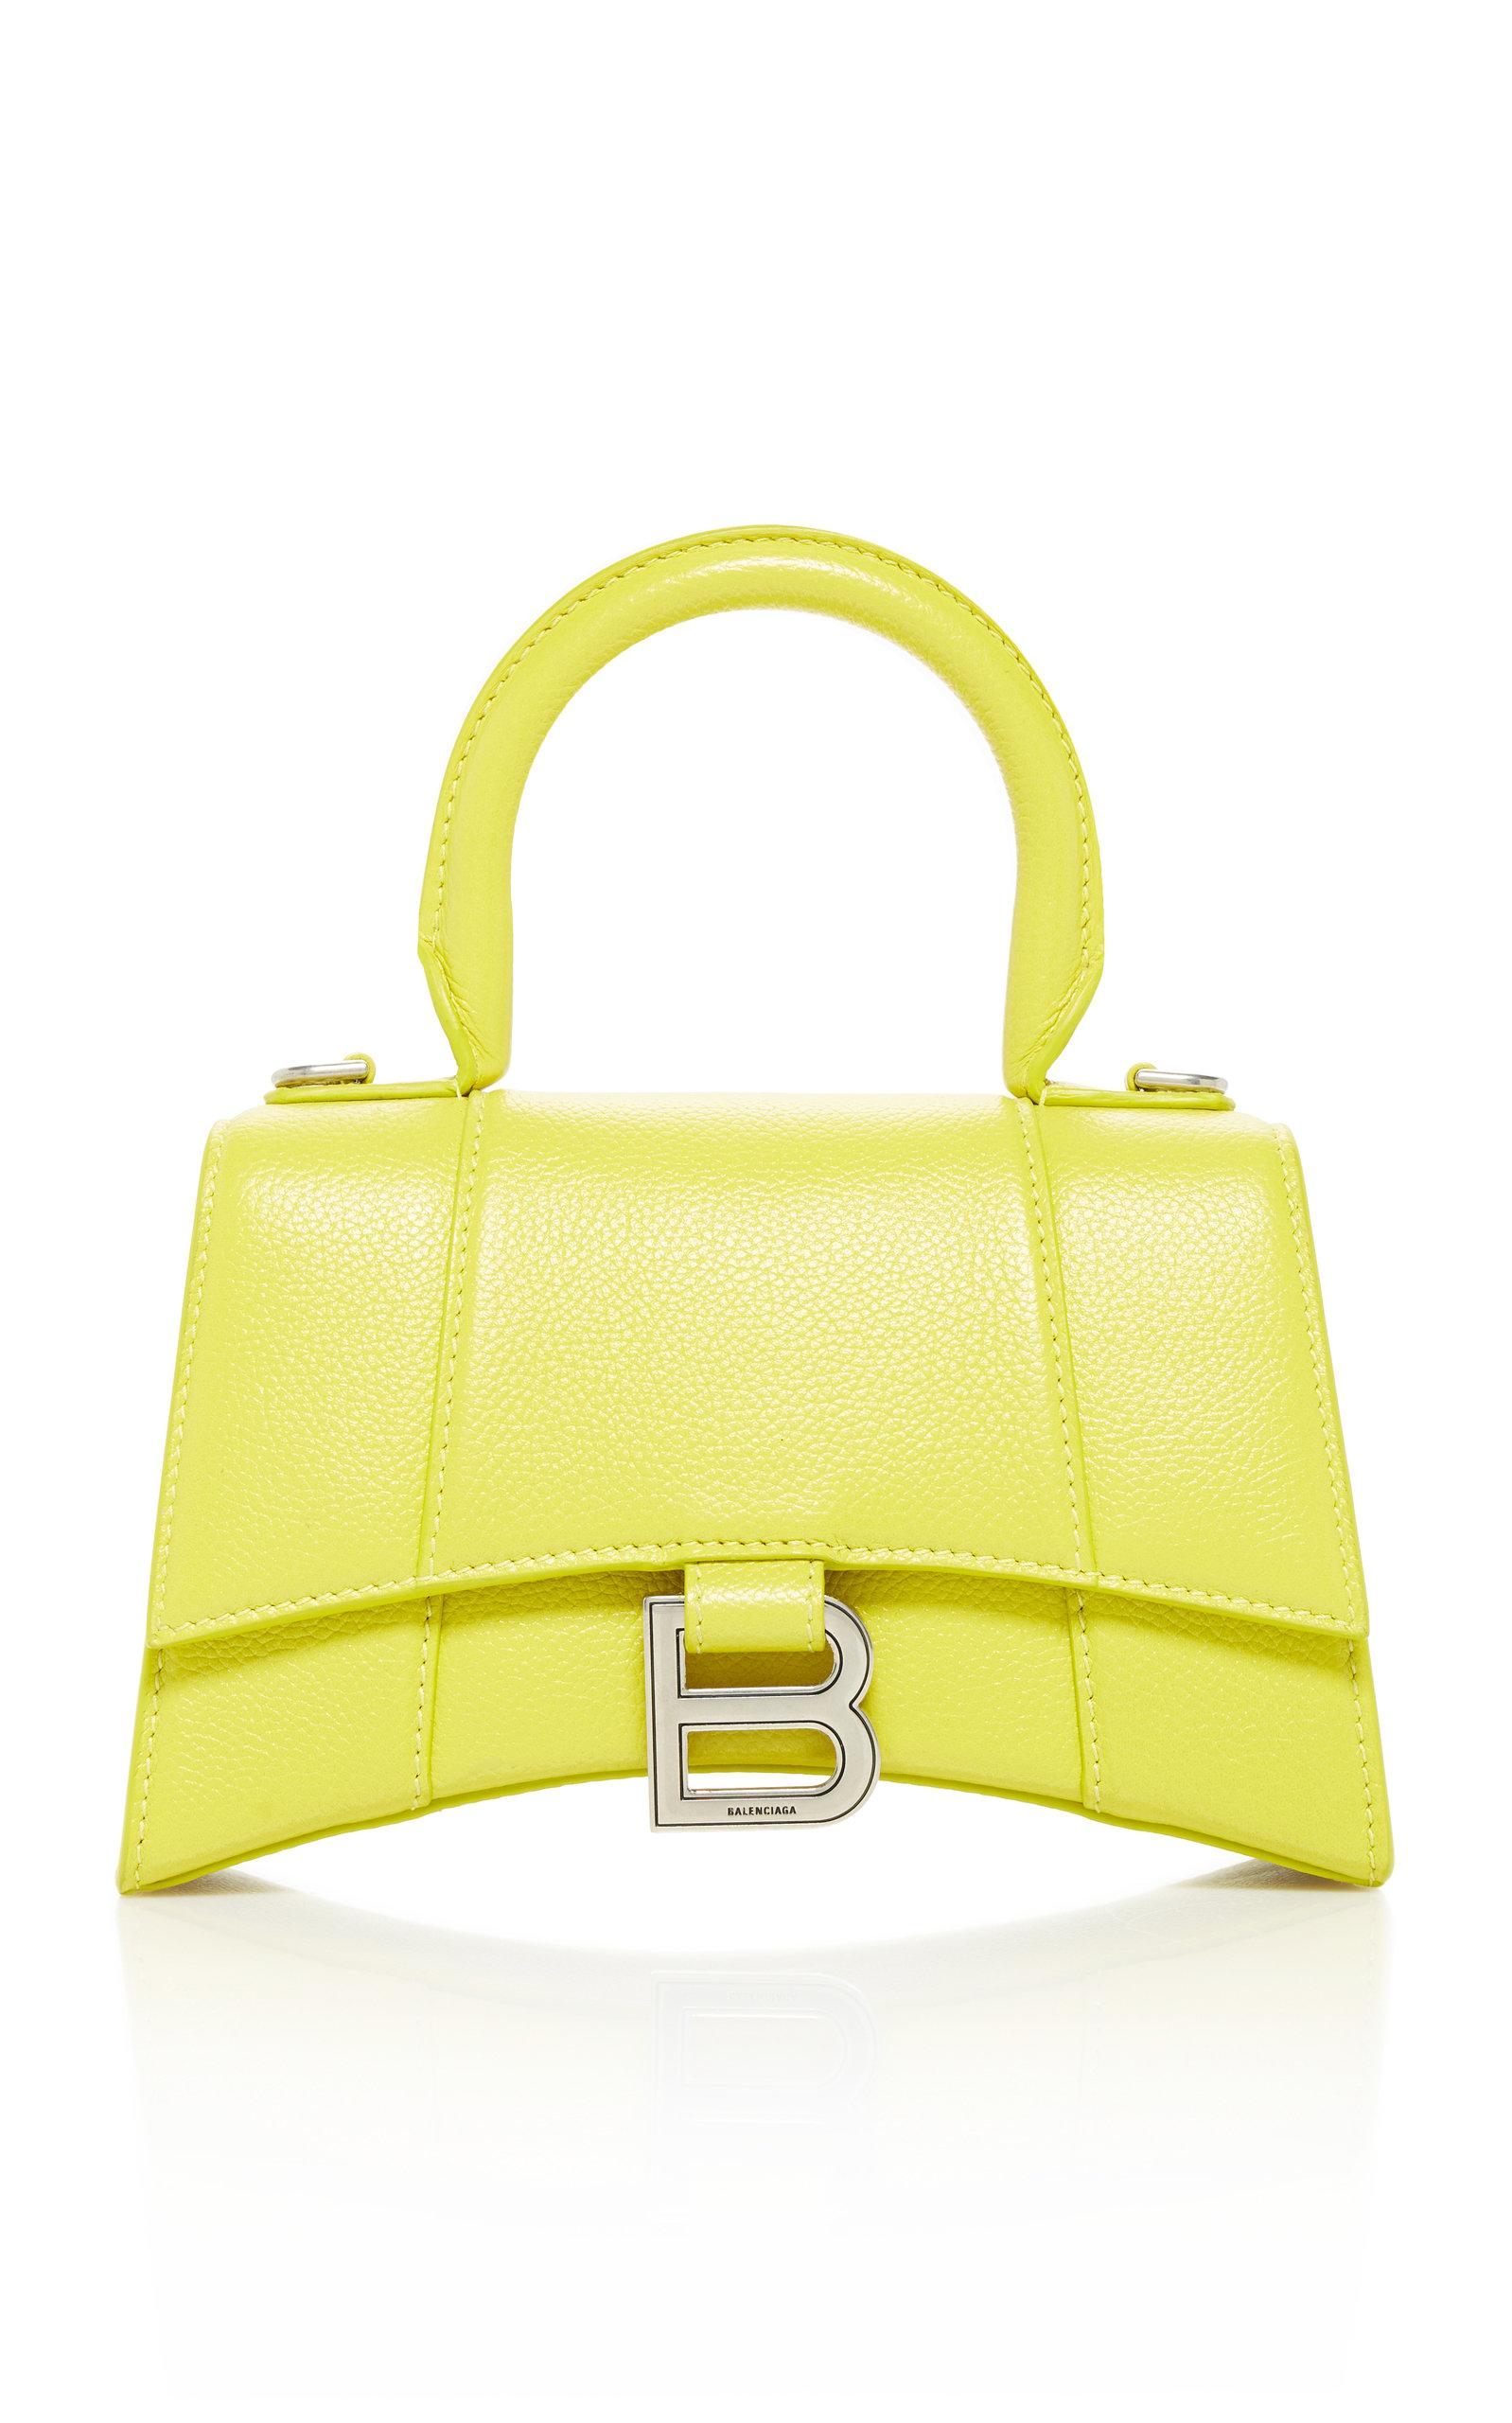 Balenciaga HOURGLASS XS EMBELLISHED TEXTURED-LEATHER TOP HANDLE BAG